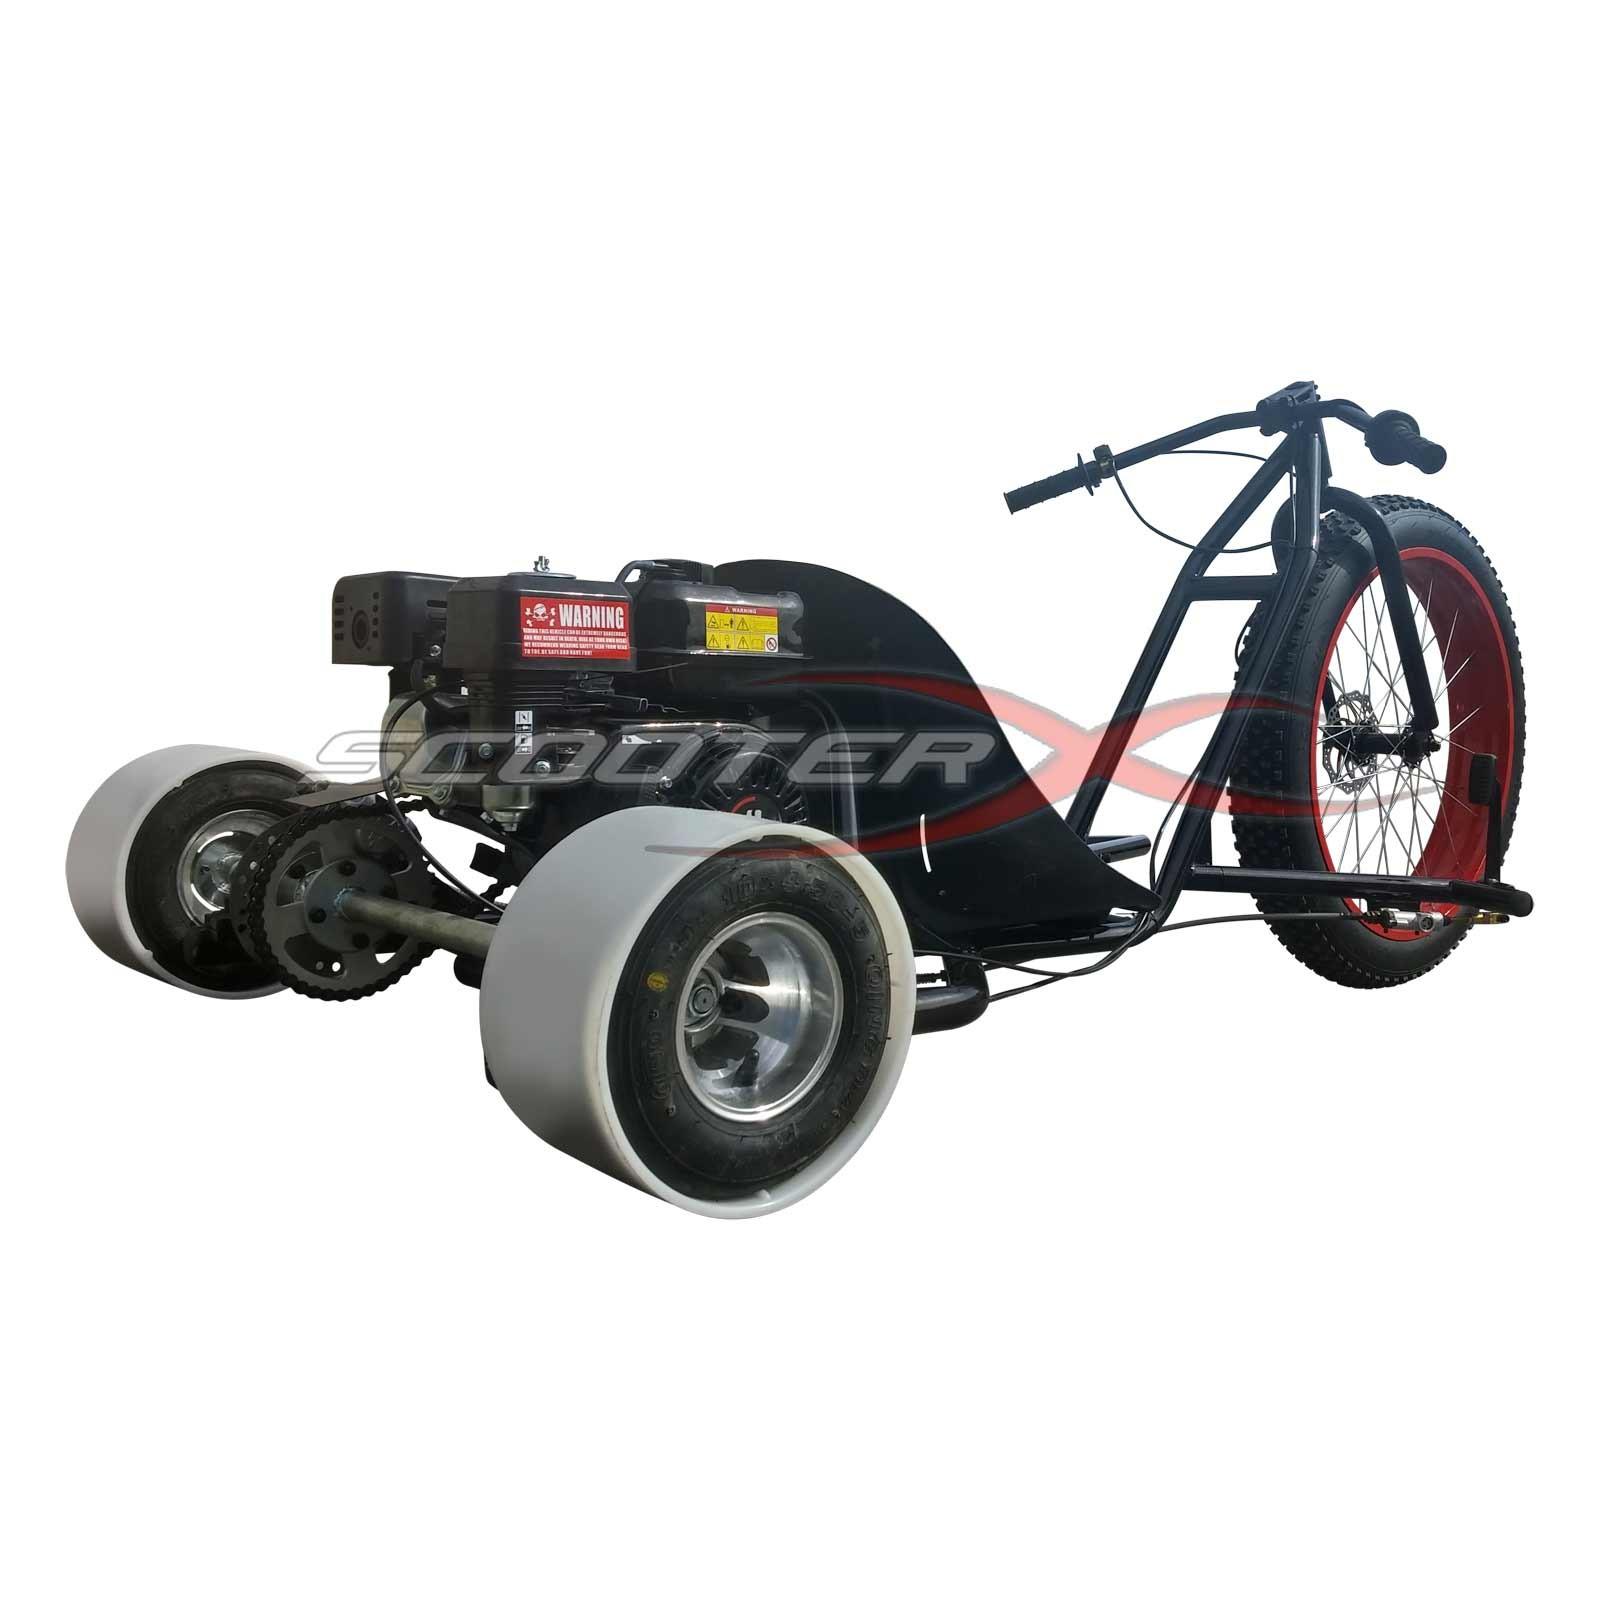 65hp Gas Powered Scooterx Drift Trike Aka Big Wheel 3 Wheeler Ground Force Electric Go Kart Parts Diagram Drifter